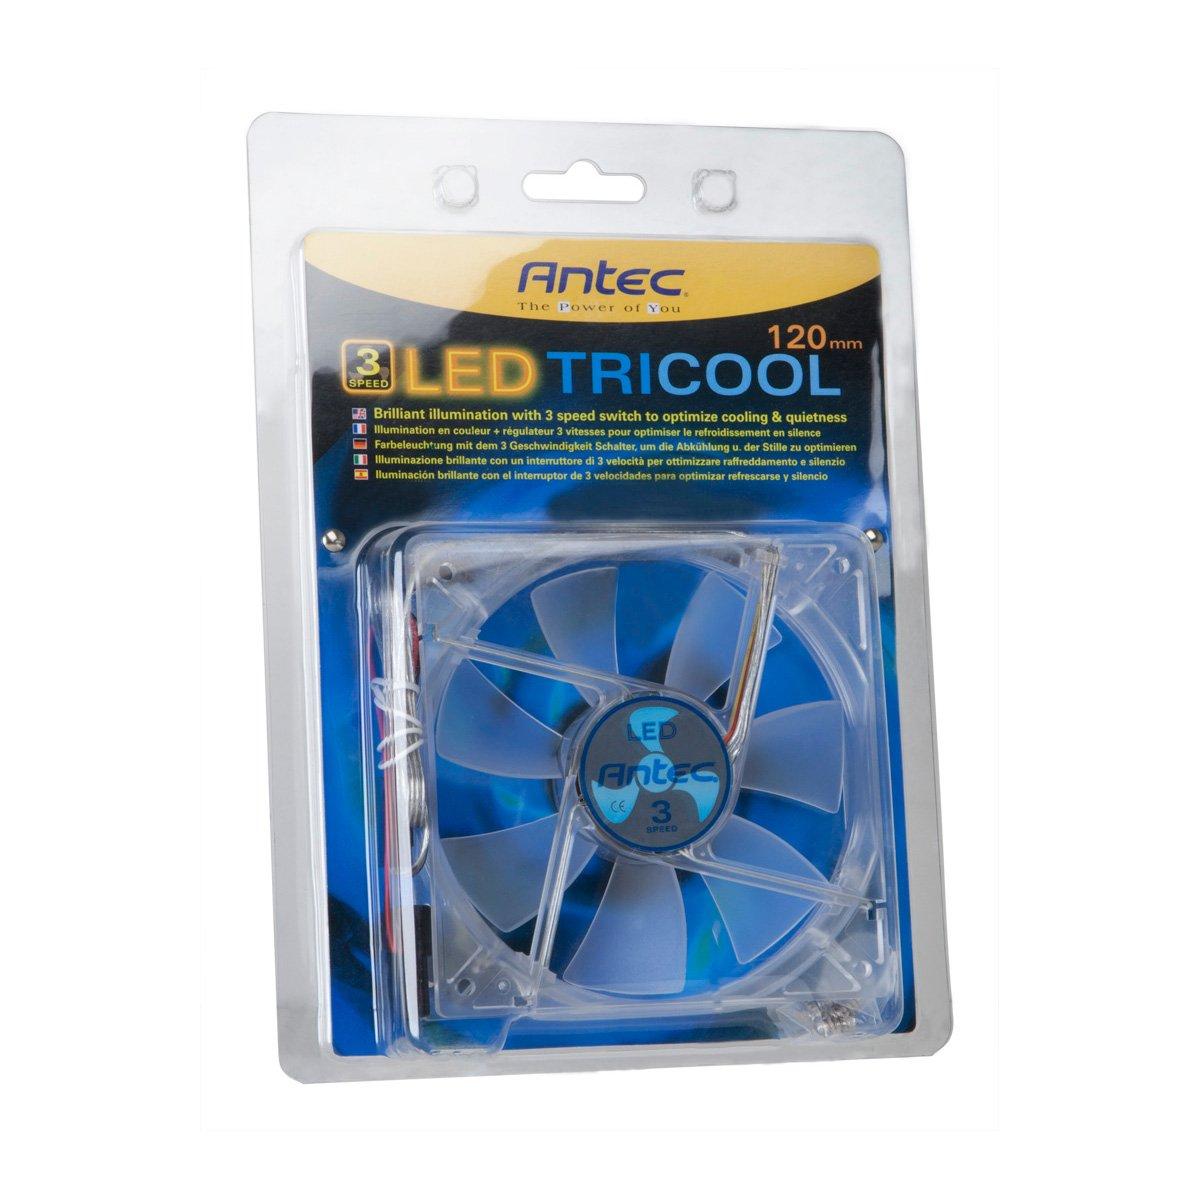 TRICOOL 120MM Antec TriCool case Fan